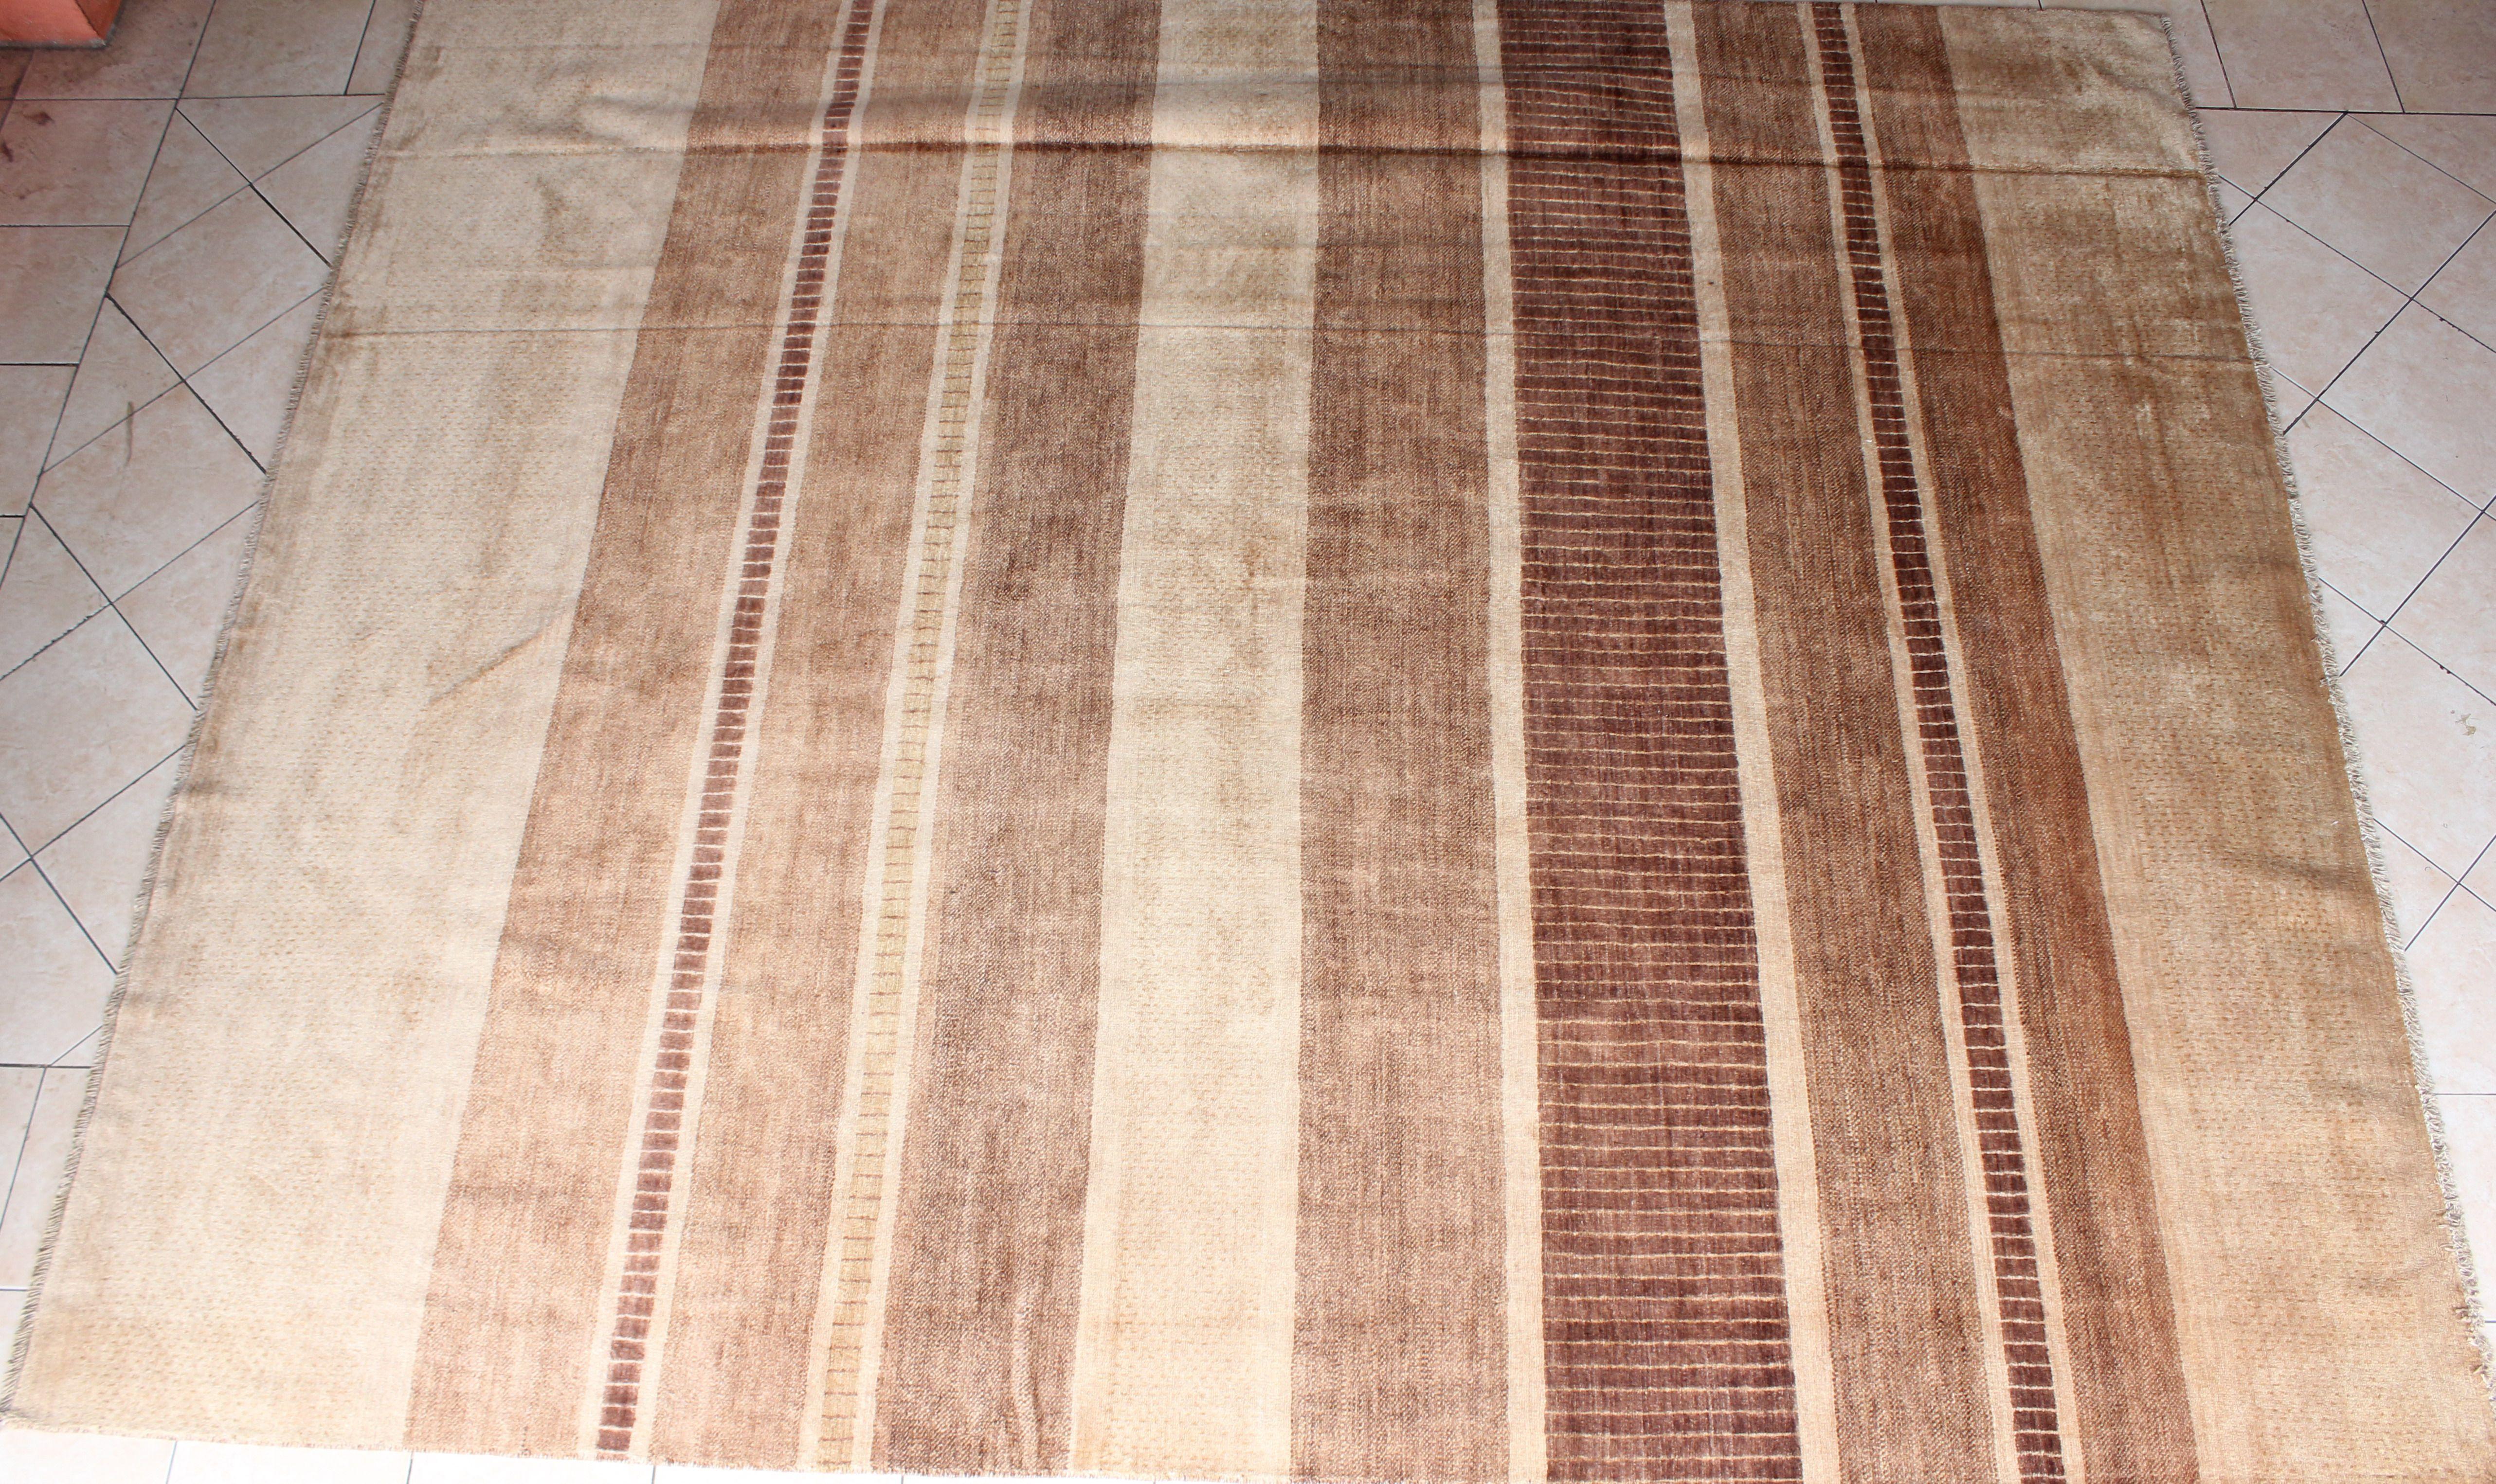 Pakistan Hand Woven Carpet Ch 365 8 X 10 Ft Chobi Wool On Cotton